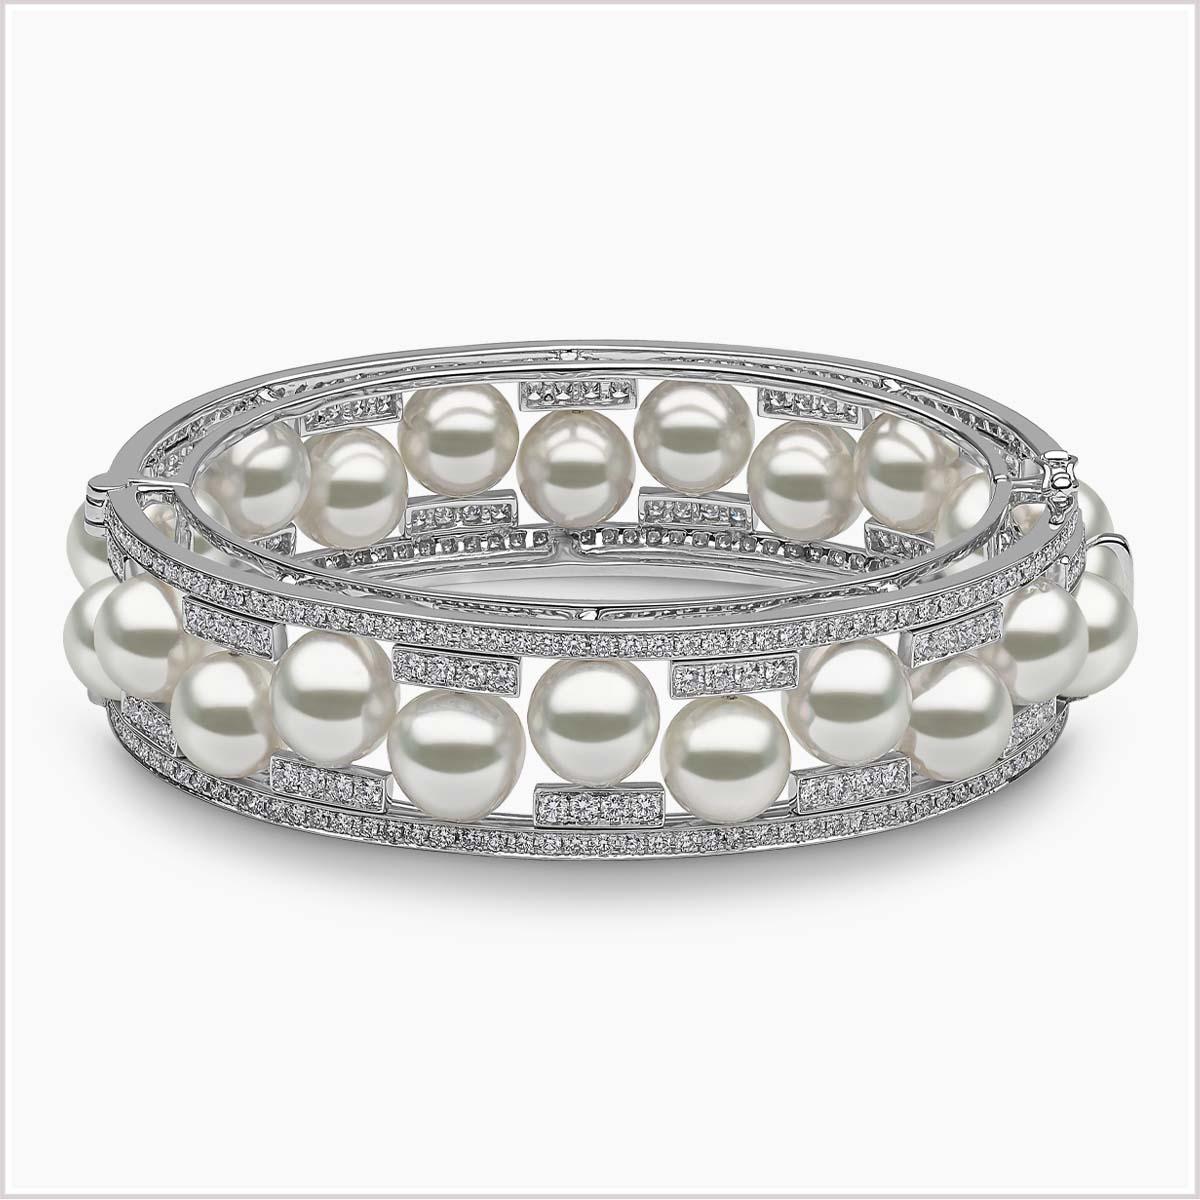 Yoko London Mayfair Diamond and South Sea Pearl Bracelet